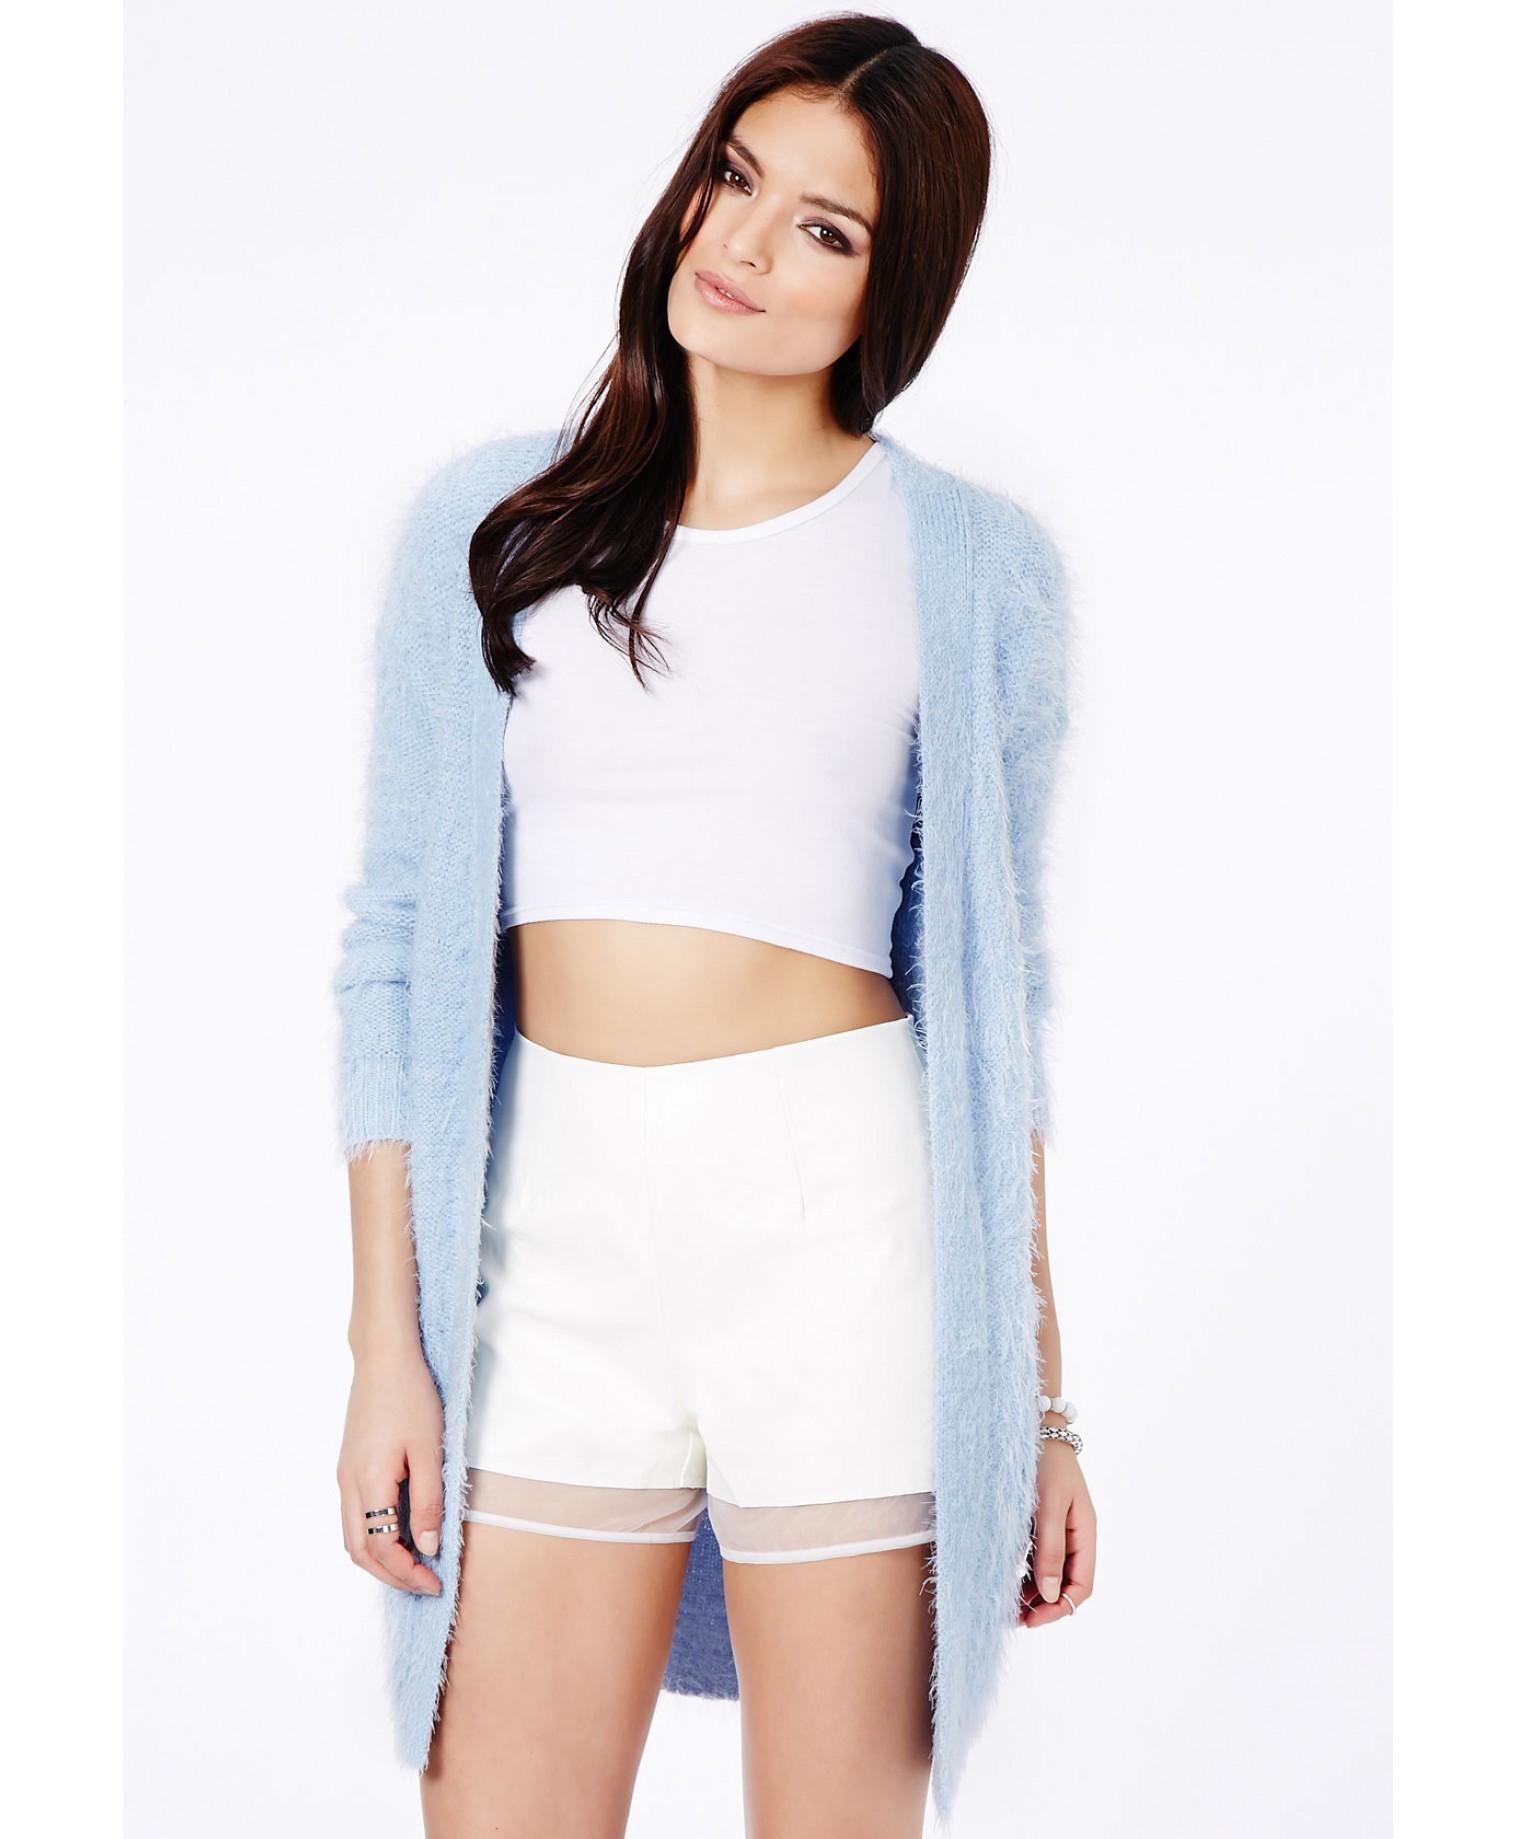 481261c046ed Missguided Satomi Eyelash Knit Cardigan in Baby Blue in Blue - Lyst